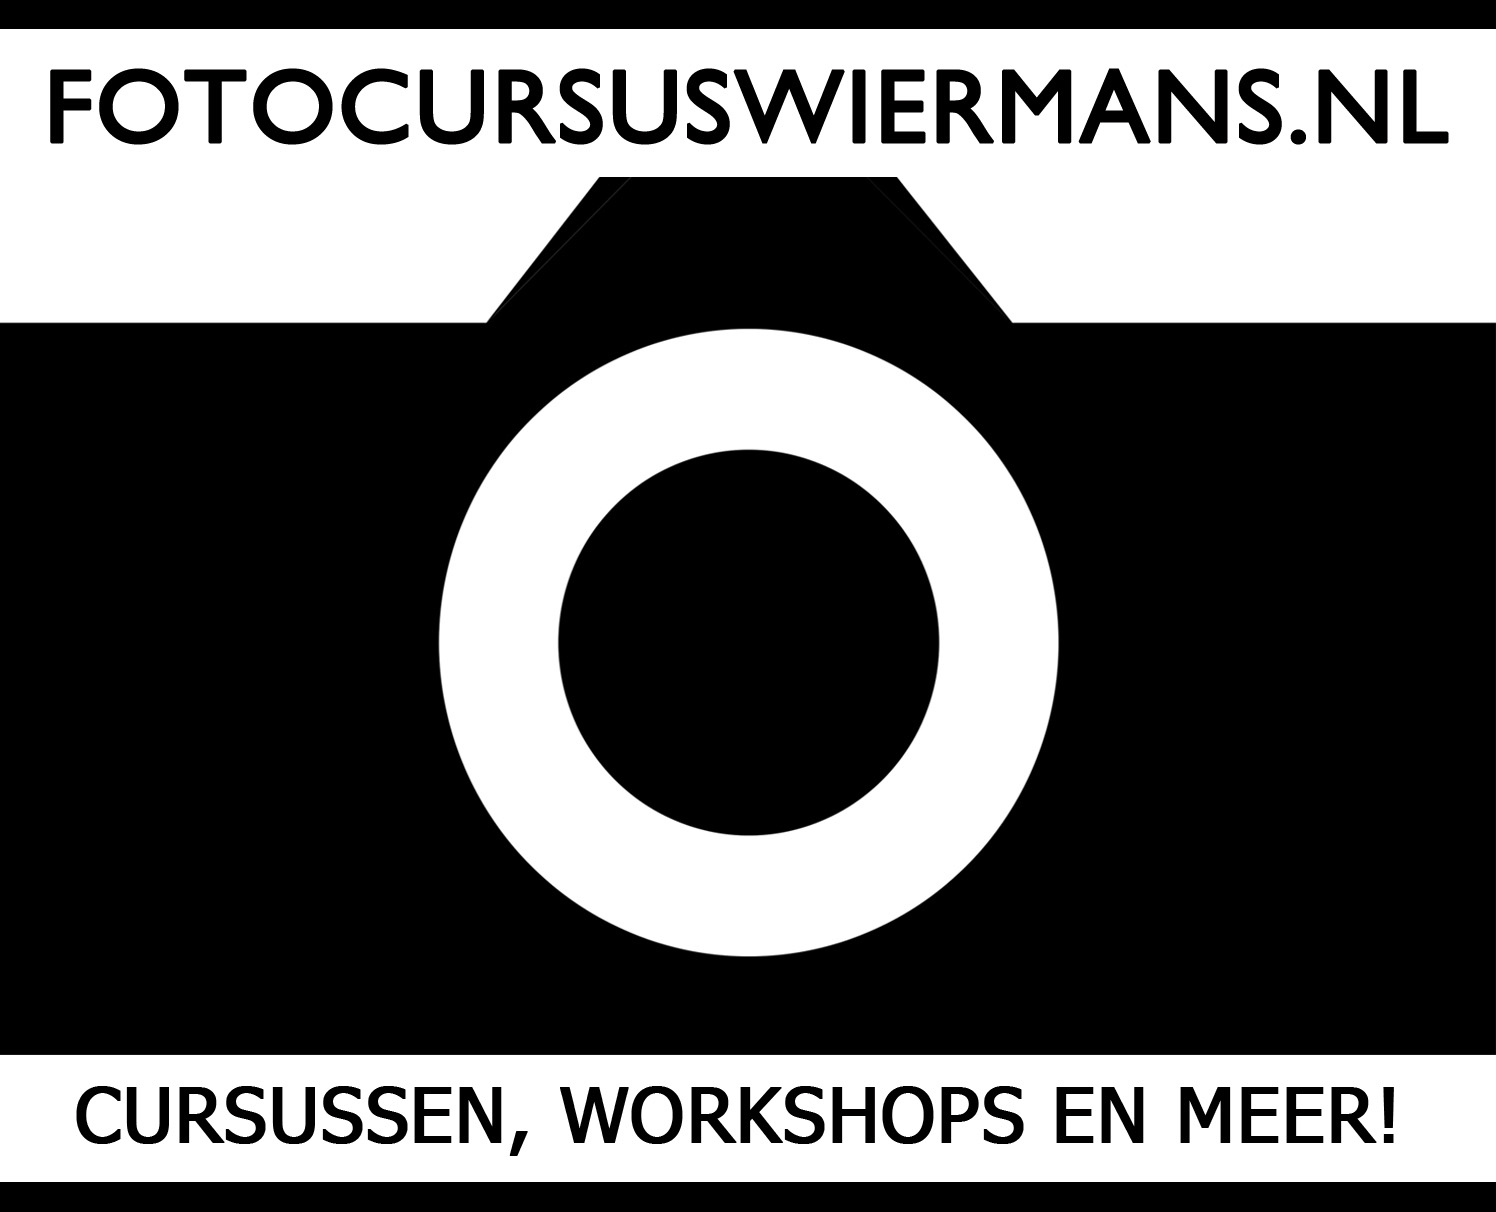 FOTOCURSUSWIERMANS